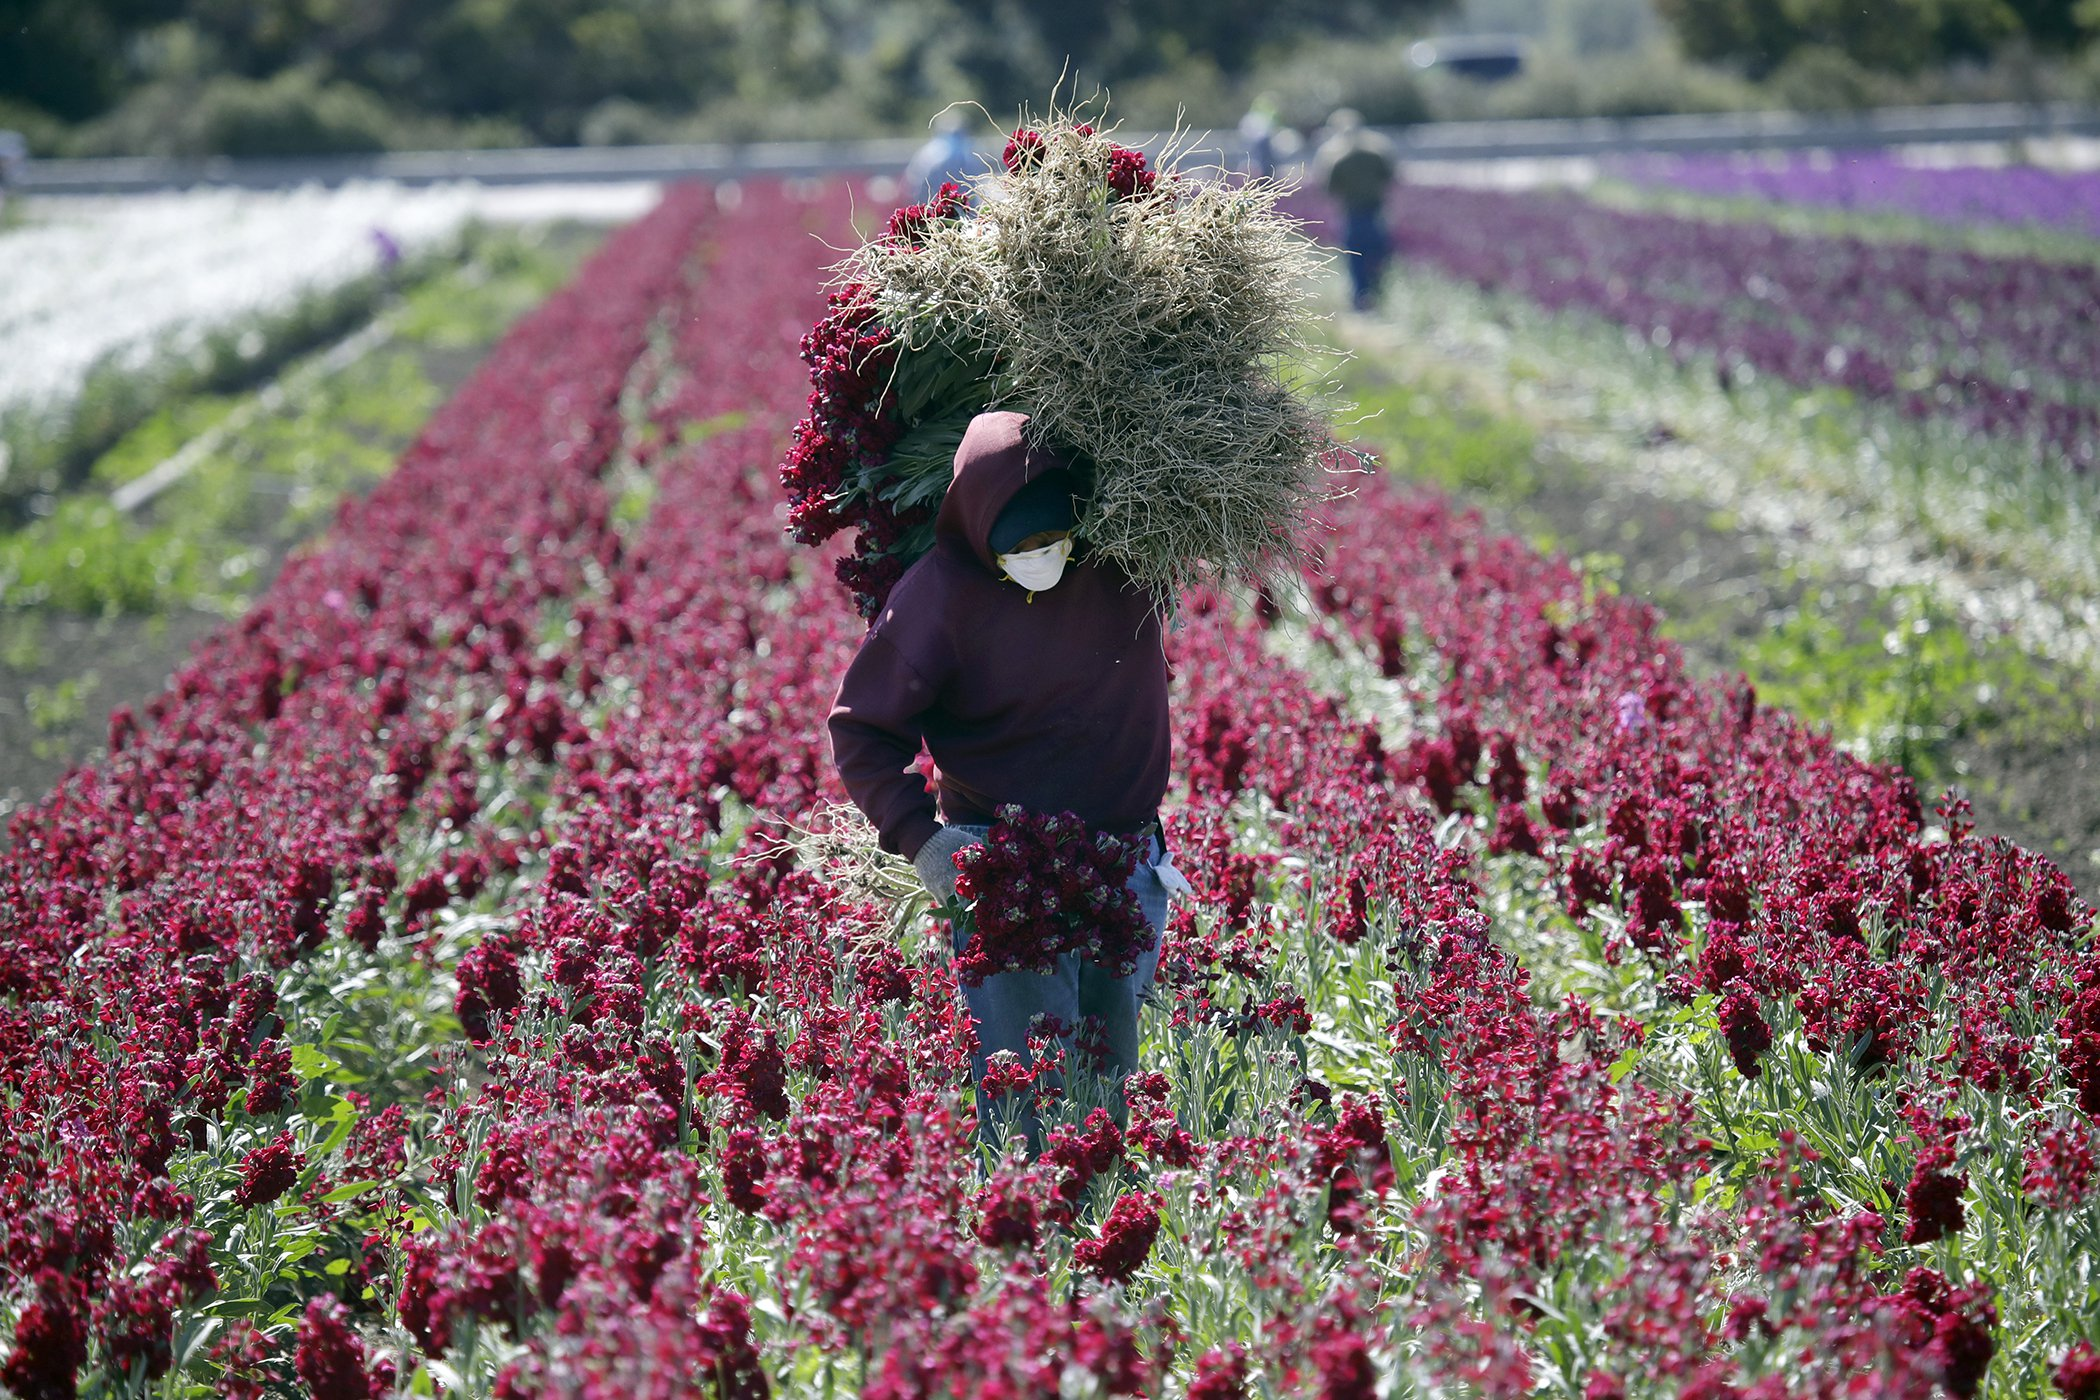 California-COVID-19-Farmworkers-Agriculture.jpg